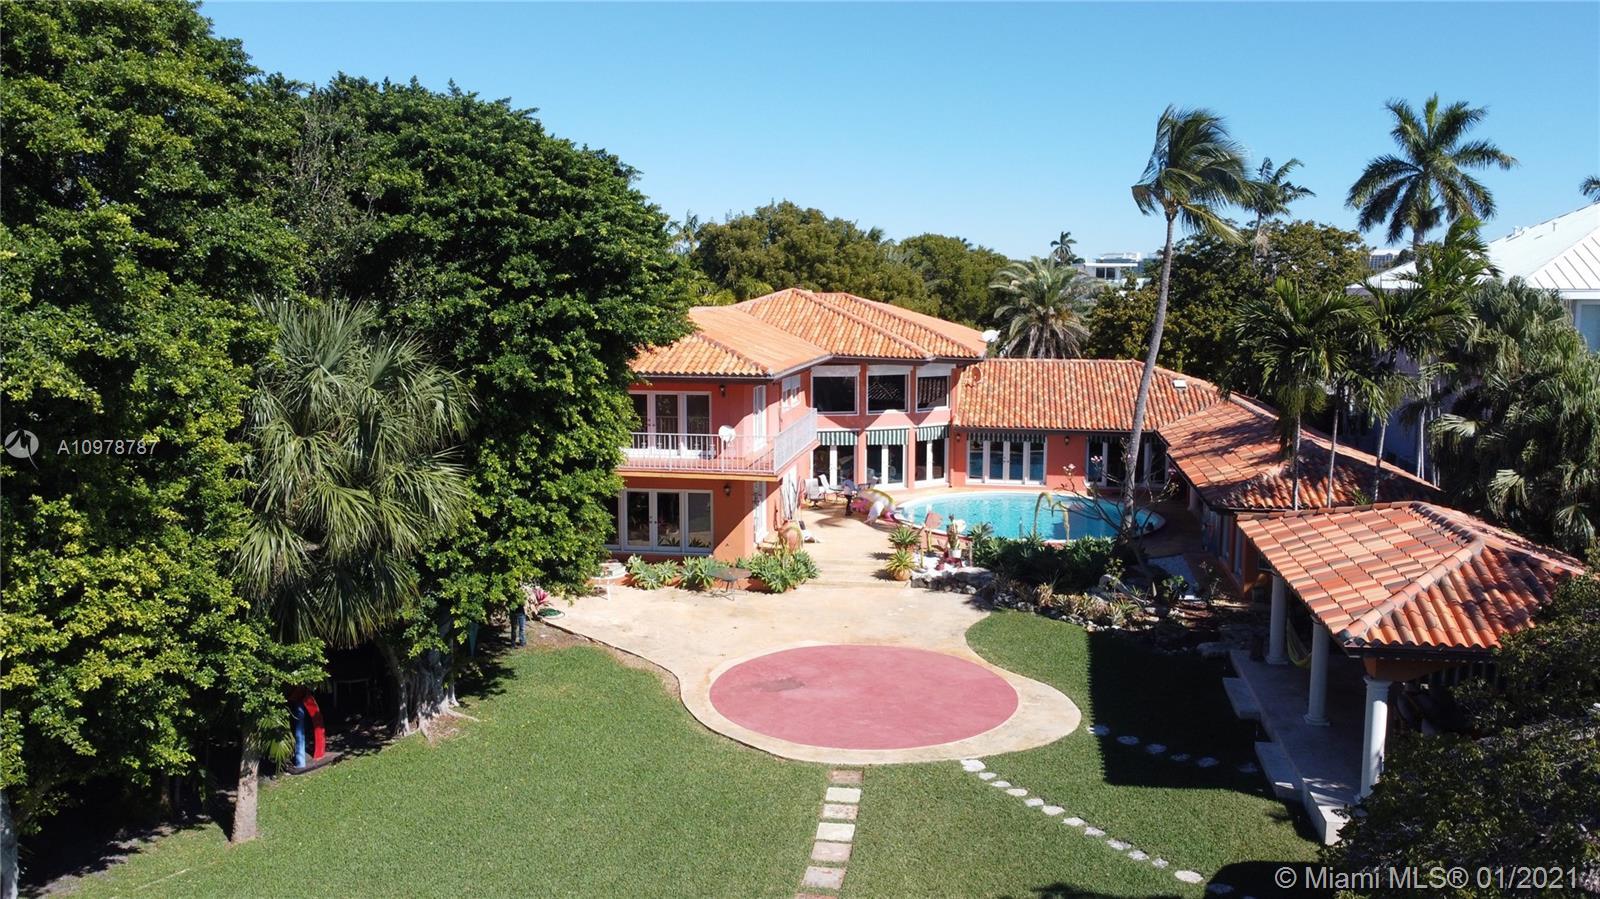 740 Harbor Dr Luxury Real Estate